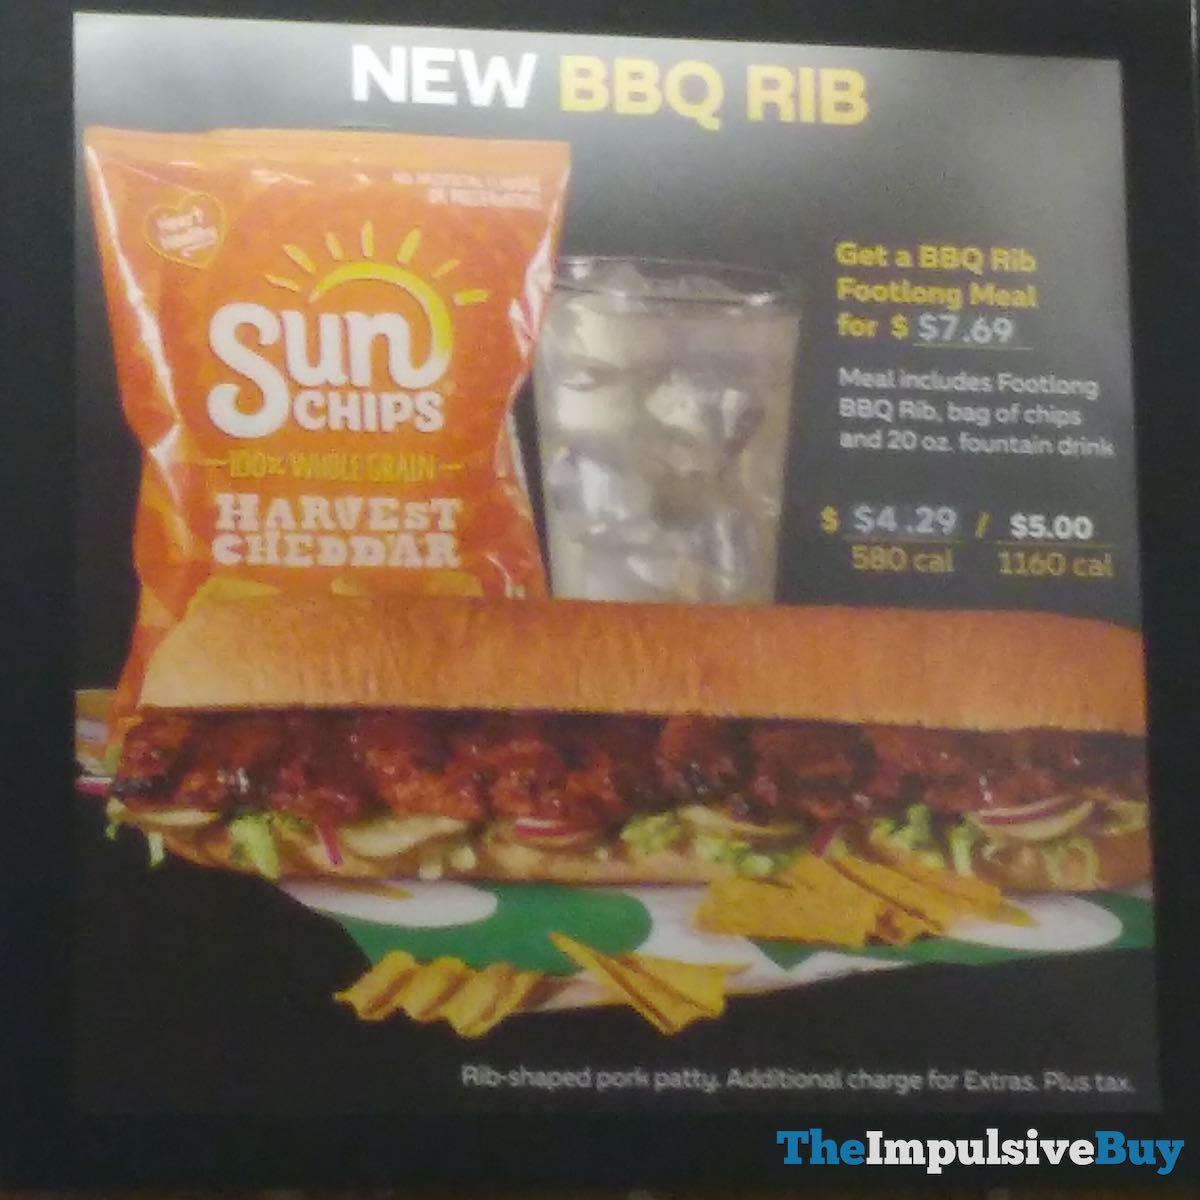 Review Subway Bbq Rib Sandwich The Impulsive Buy